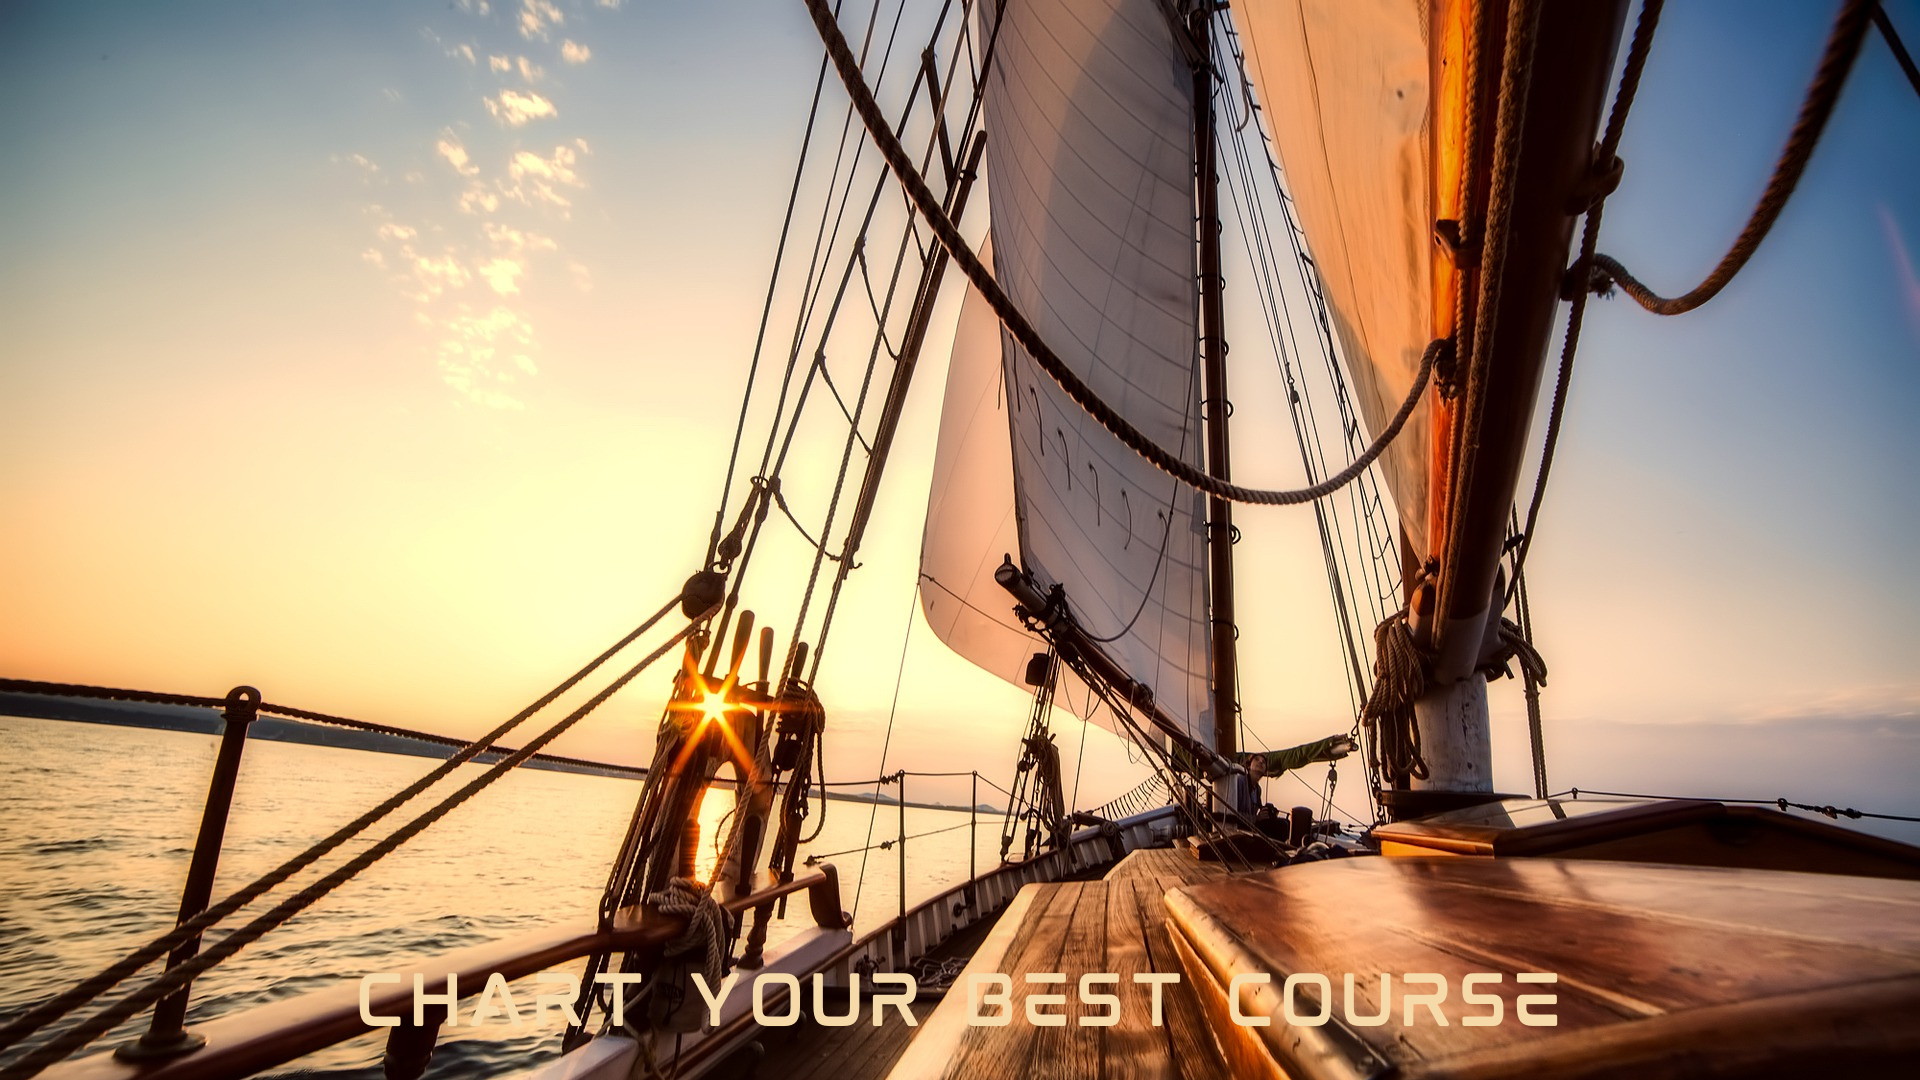 midlife-crisis-quiz-chart-your-best-course